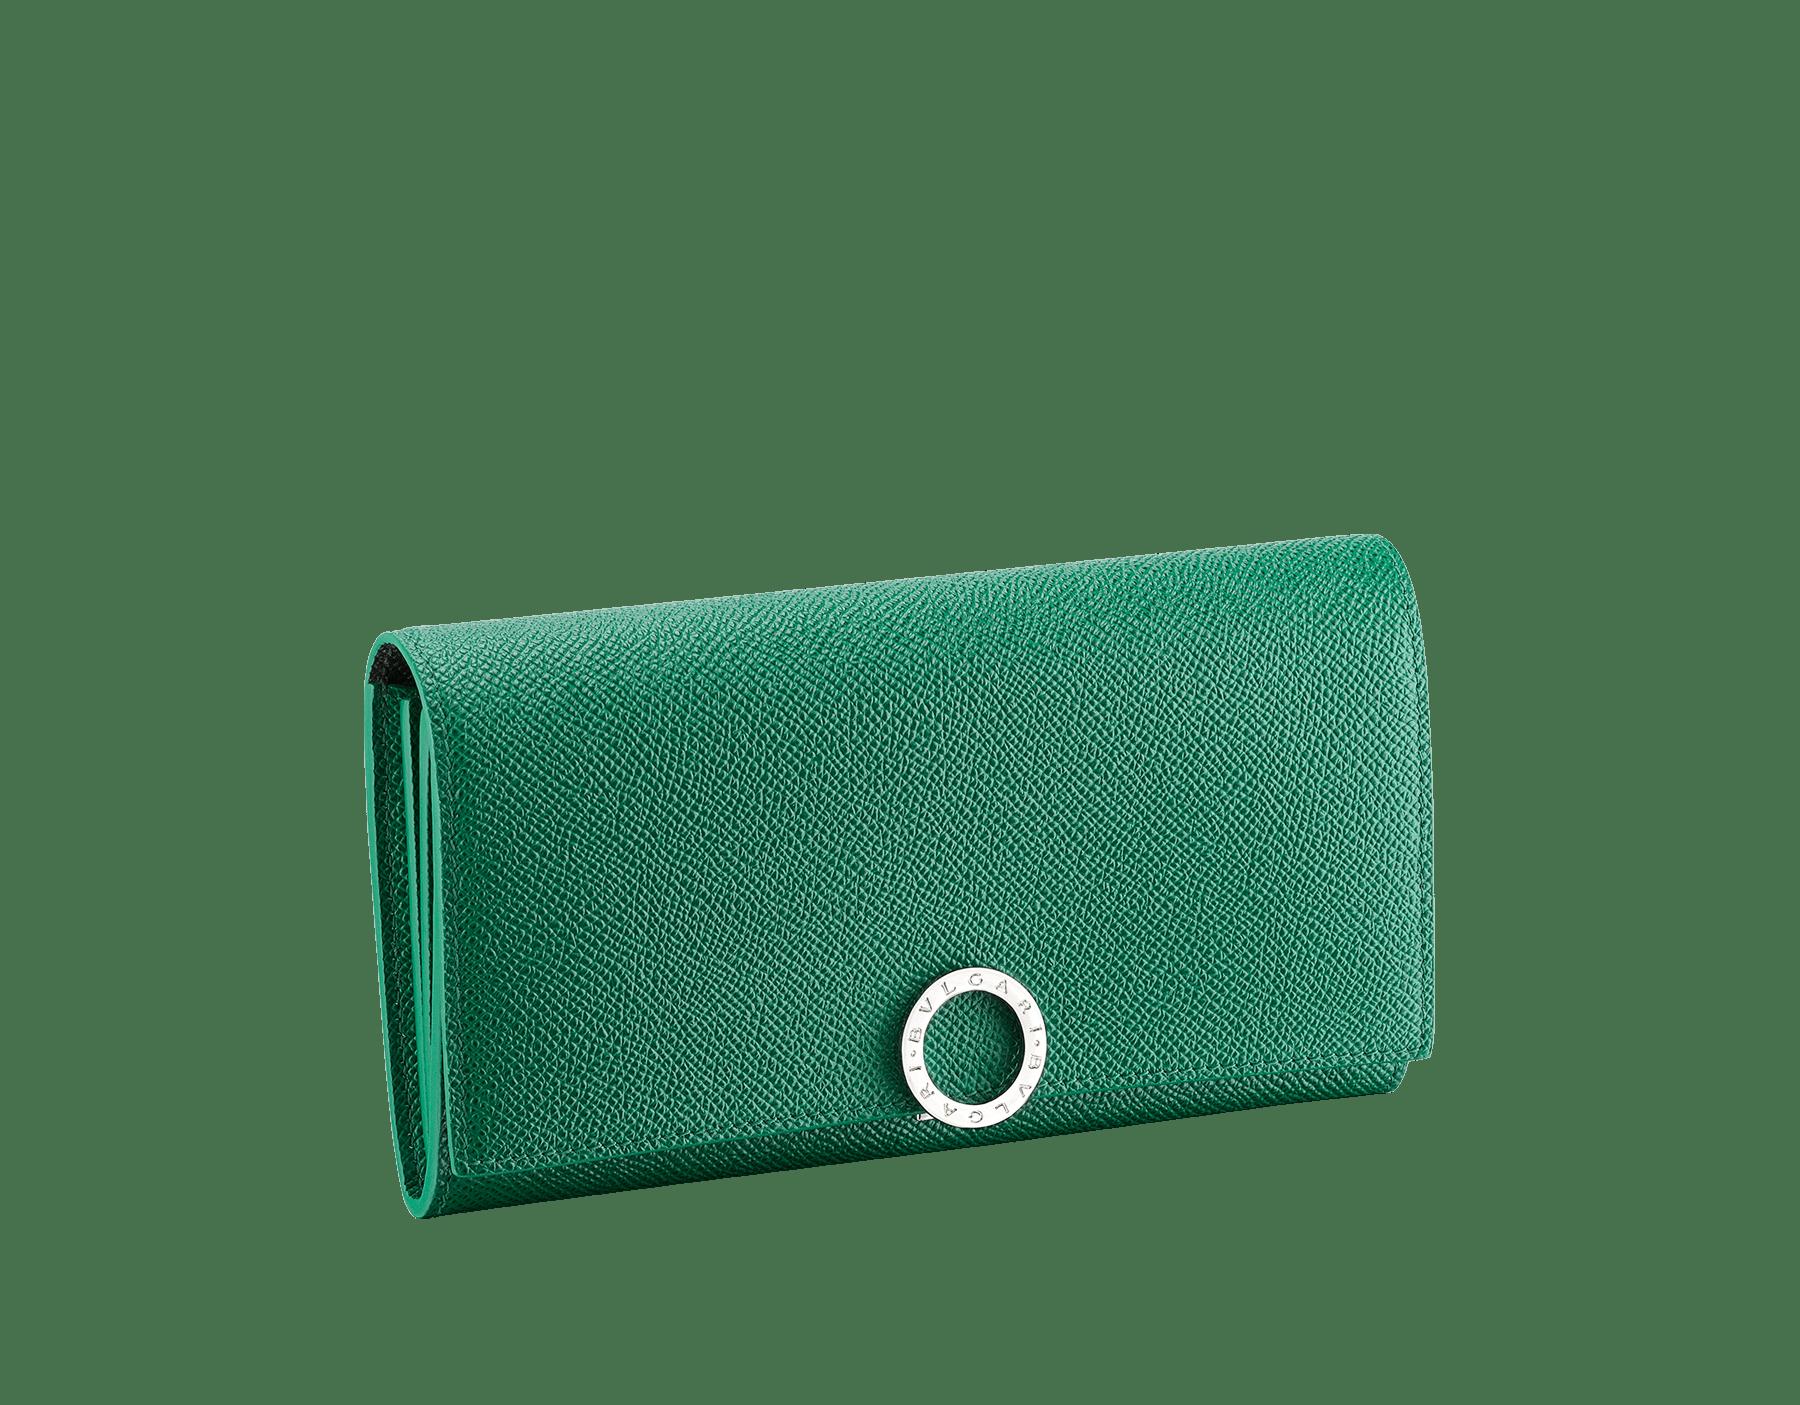 BVLGARI BVLGARI wallet pochette in emerald green and black grain calf leather. Iconic logo clip closure in palladium-plated brass. 289379 image 1